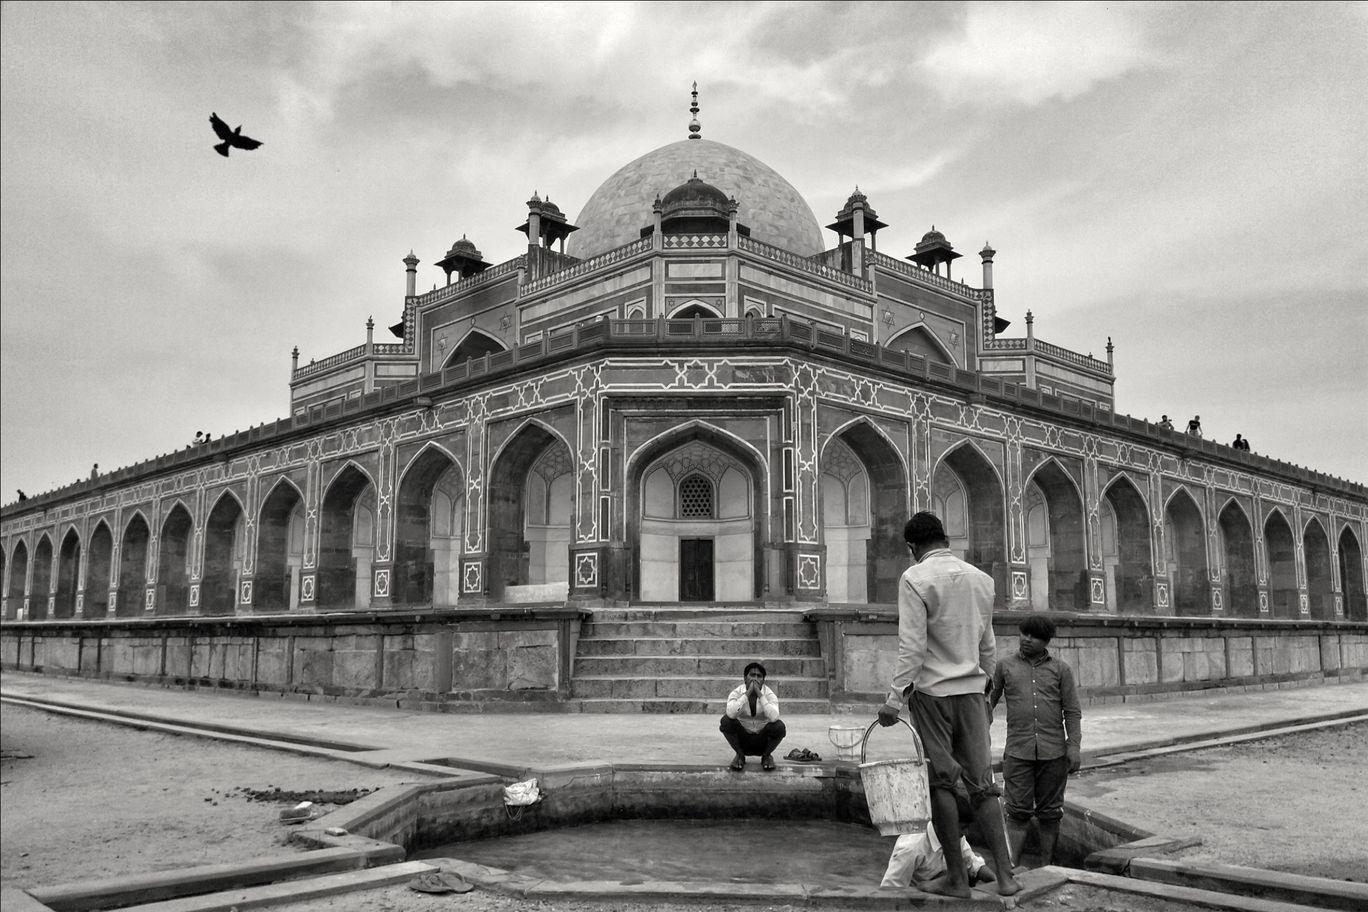 Photo of Humayun's Tomb By Ankit Kr